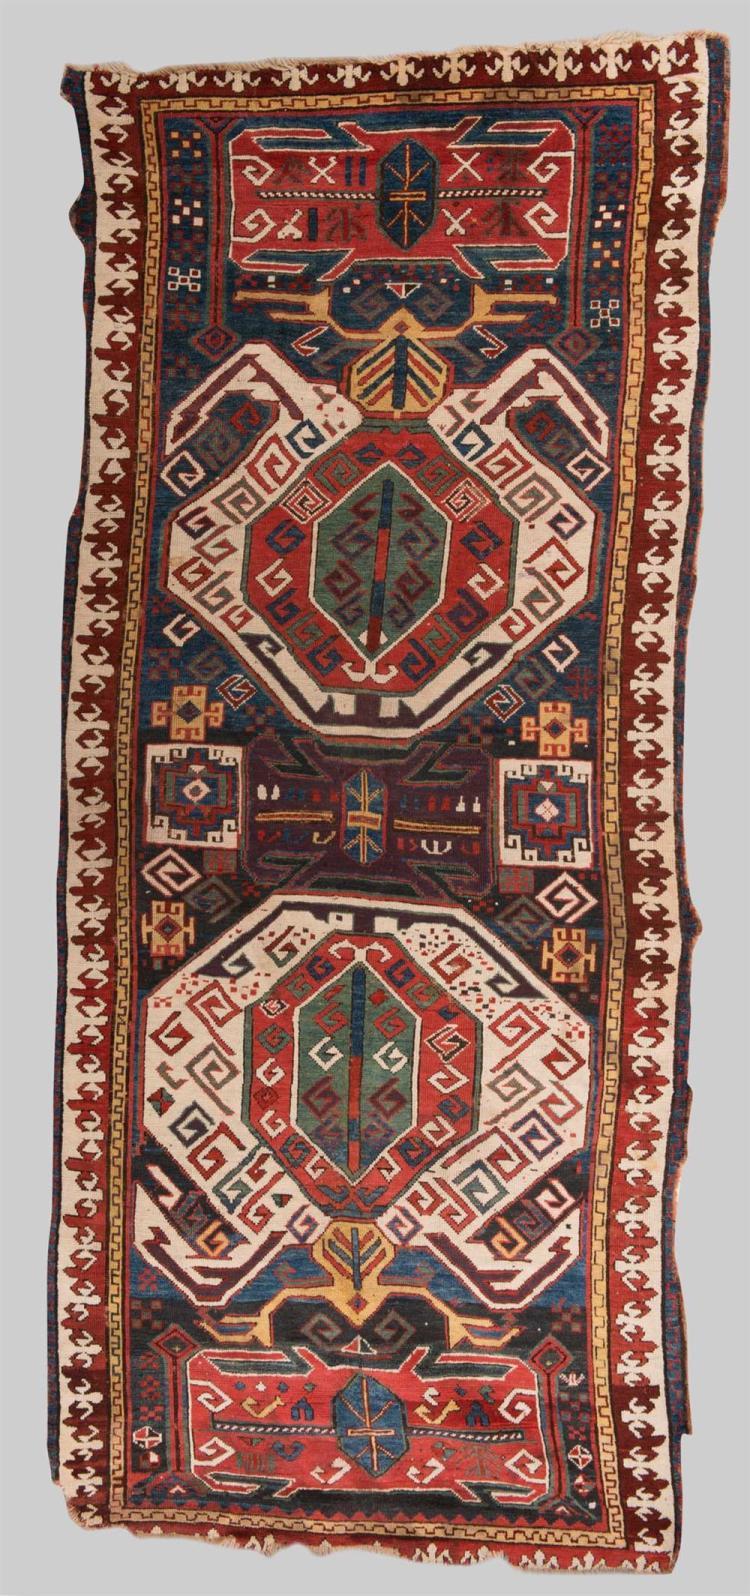 KARABAGH LENKORAN RUG, Caucasus, mid 19th century; 9 ft. 6 in . x 4 ft.